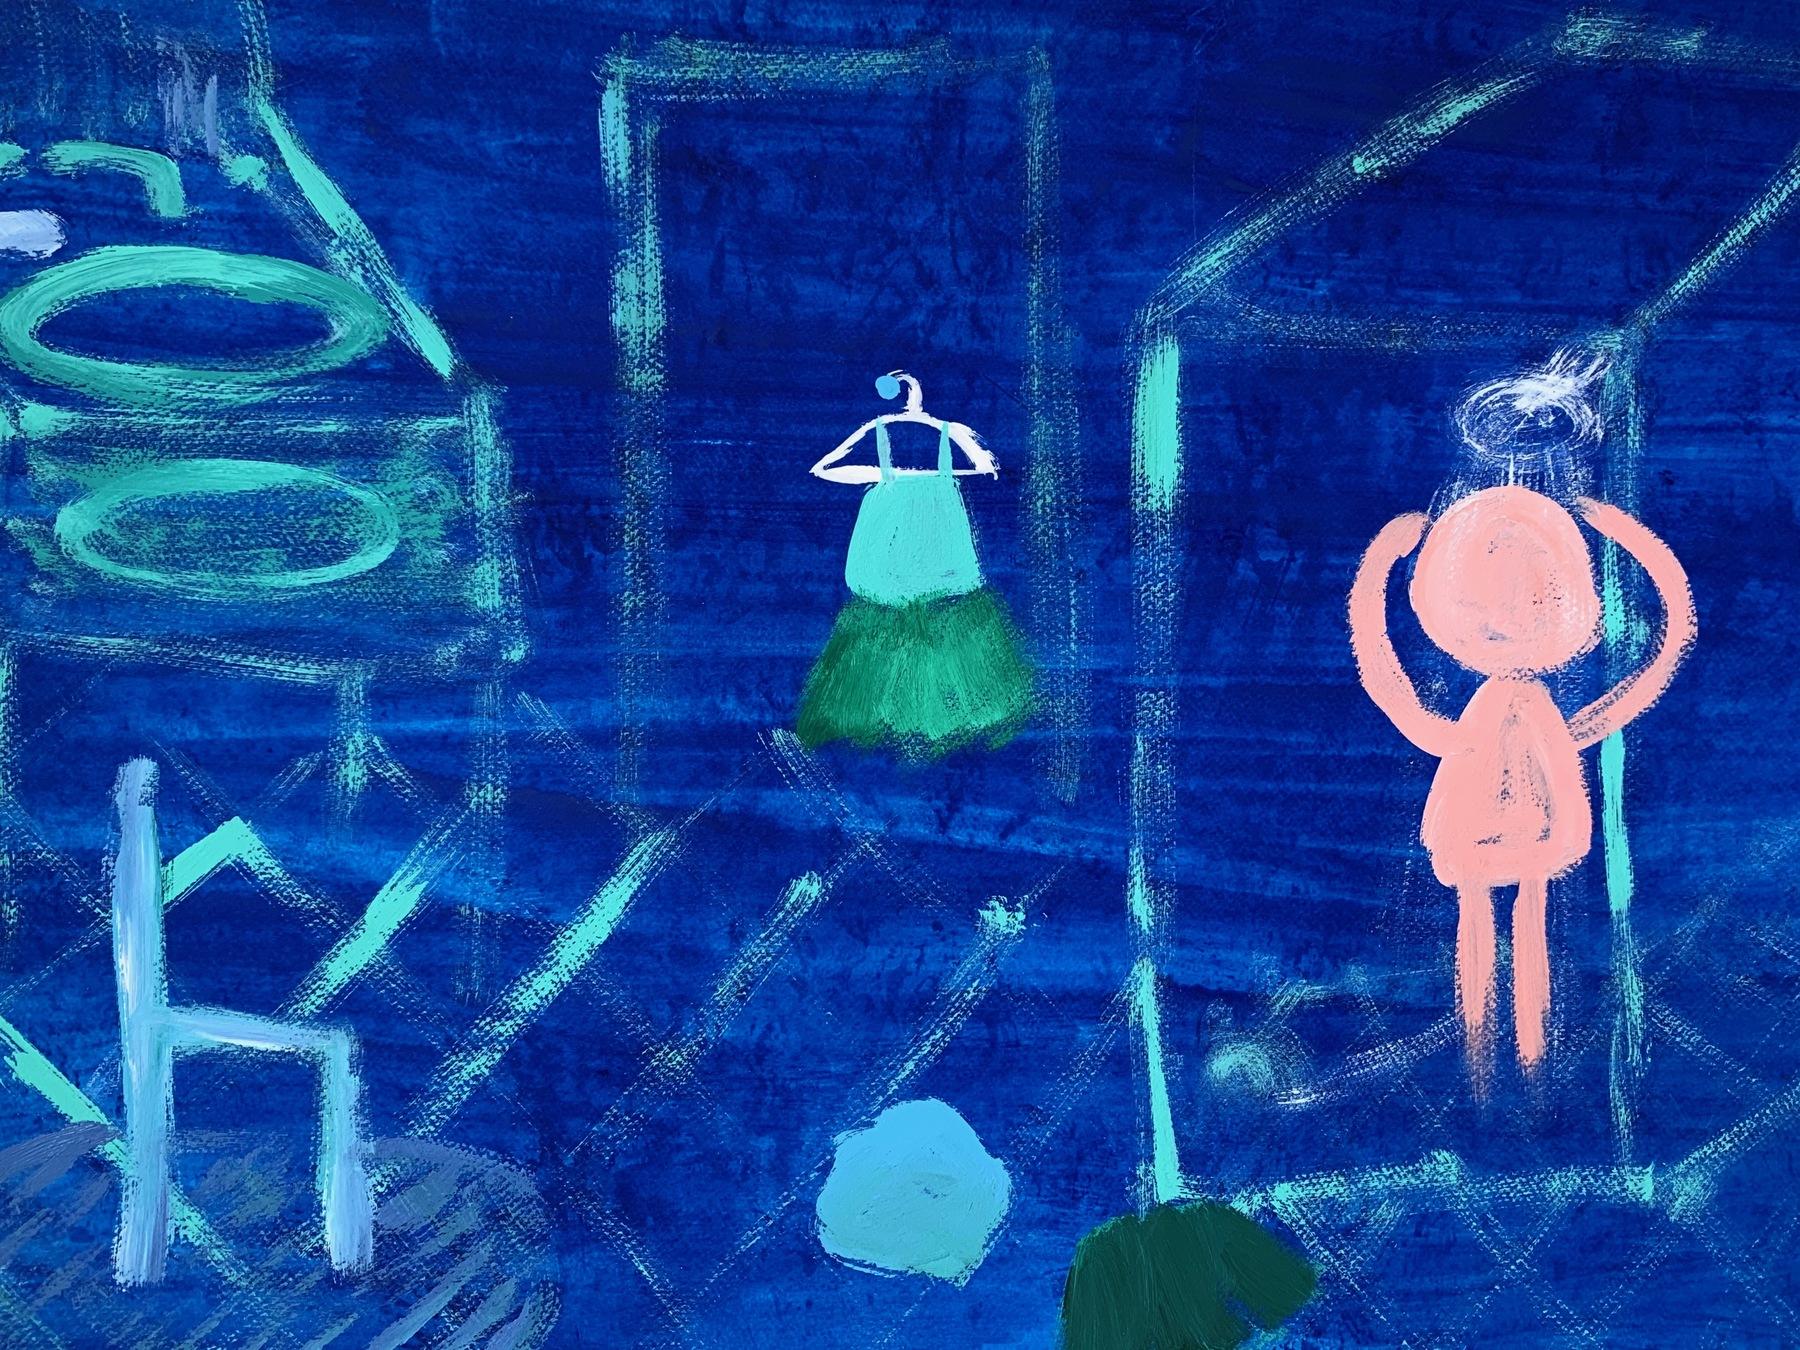 Blue 11 (Shower 1)